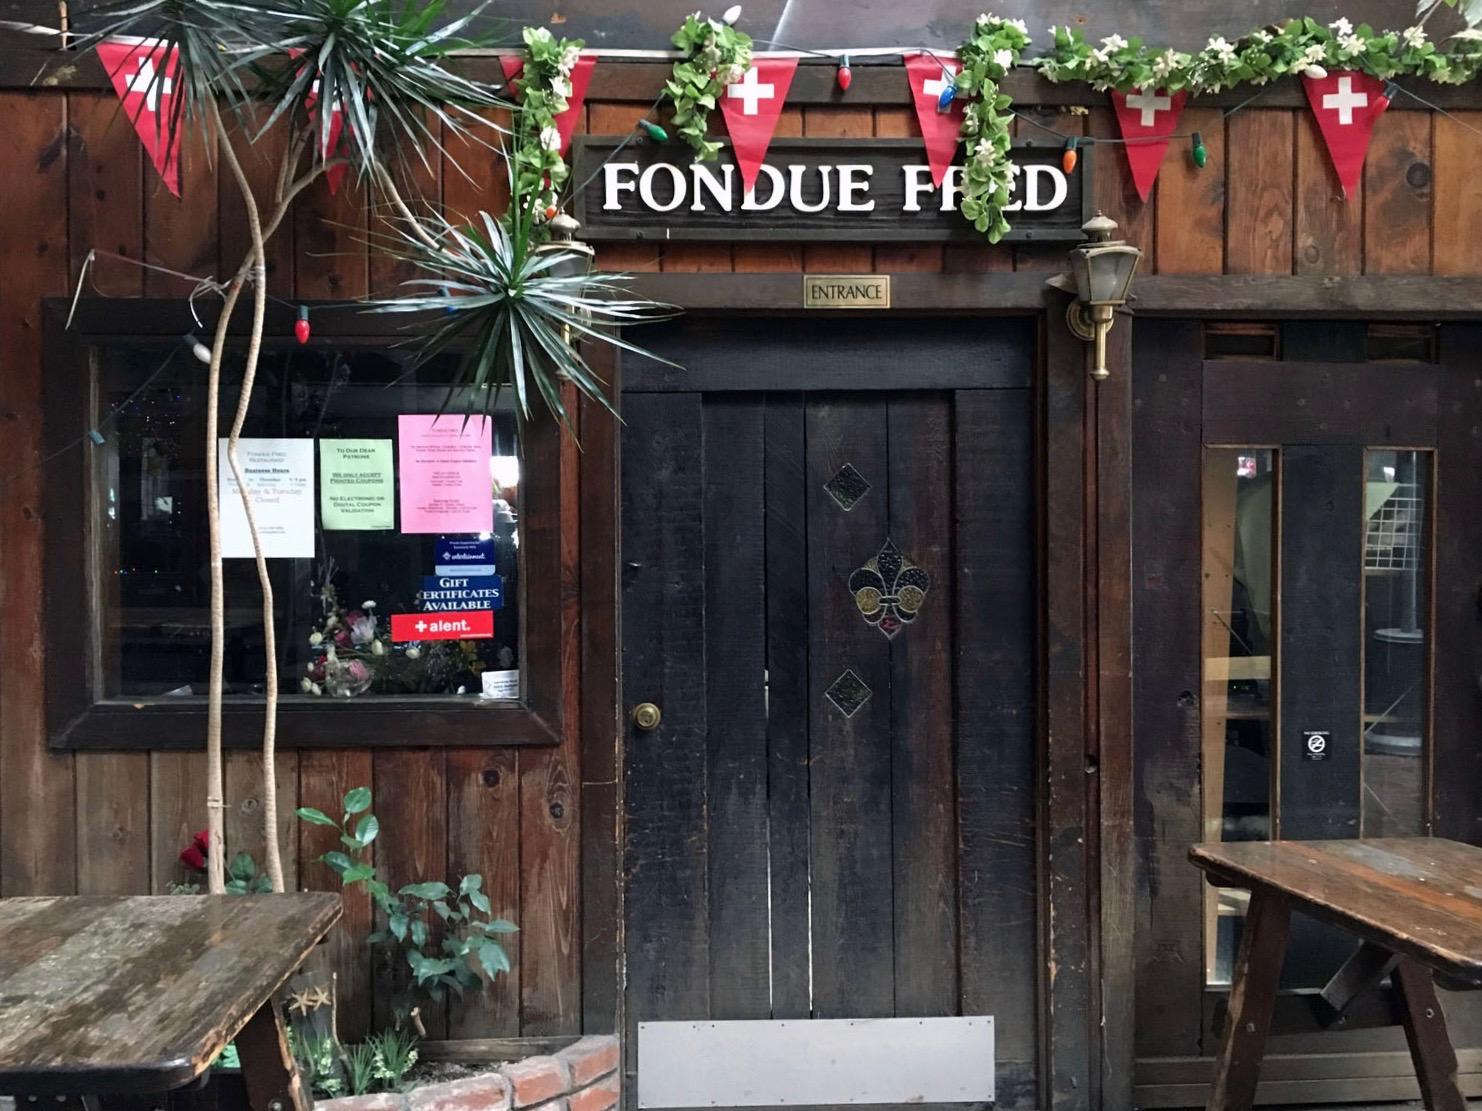 The entrance to Berkeley's Fondue Fred restaurant inside The Village.